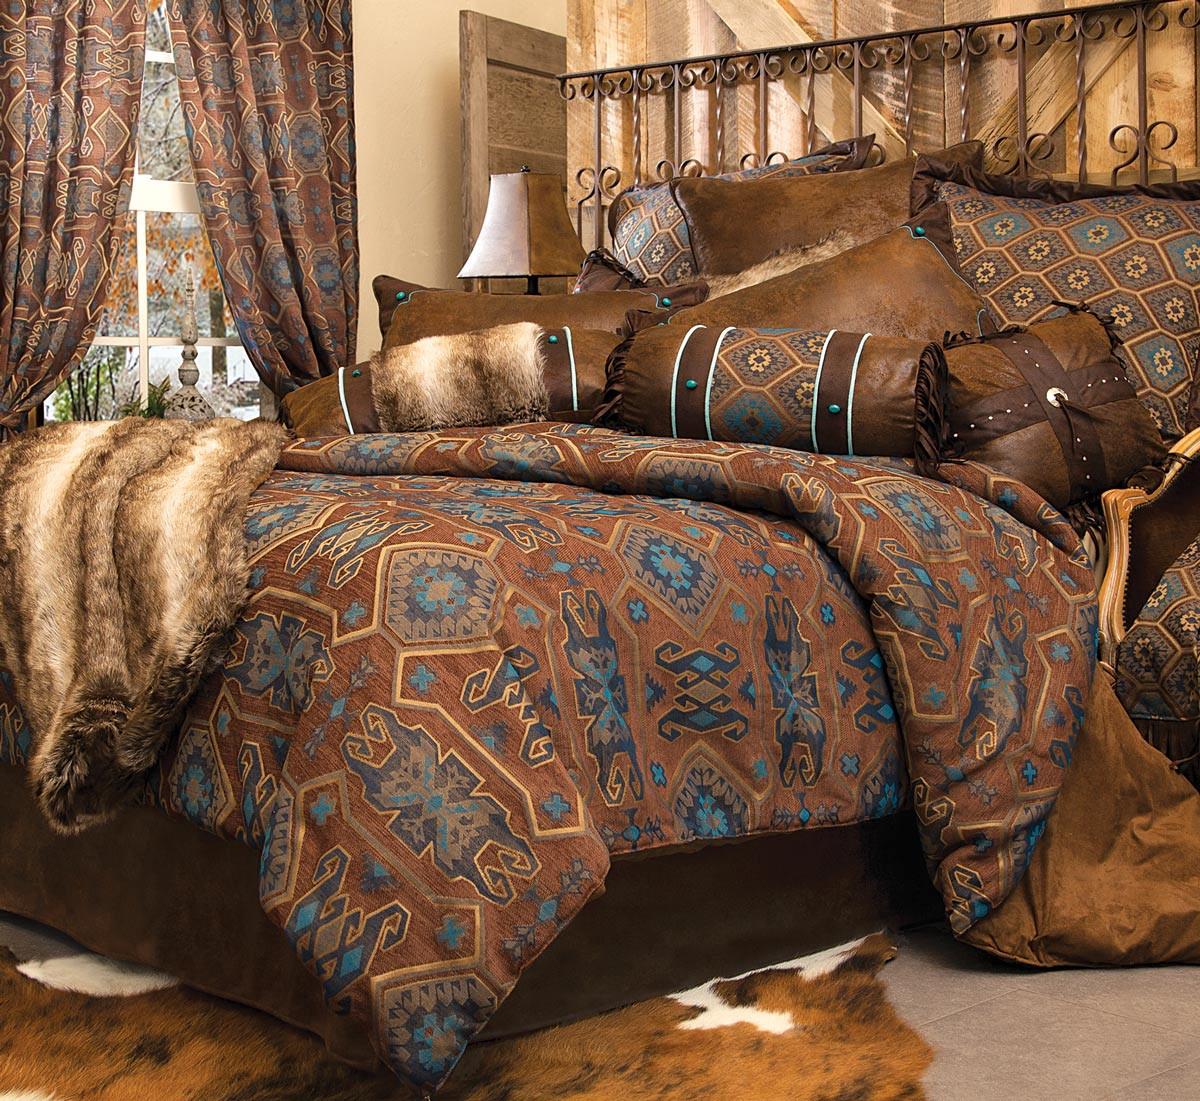 Rustic Bedroom Set King  Rustic Bedding King Size Turquoise Mesa Bed Set Black